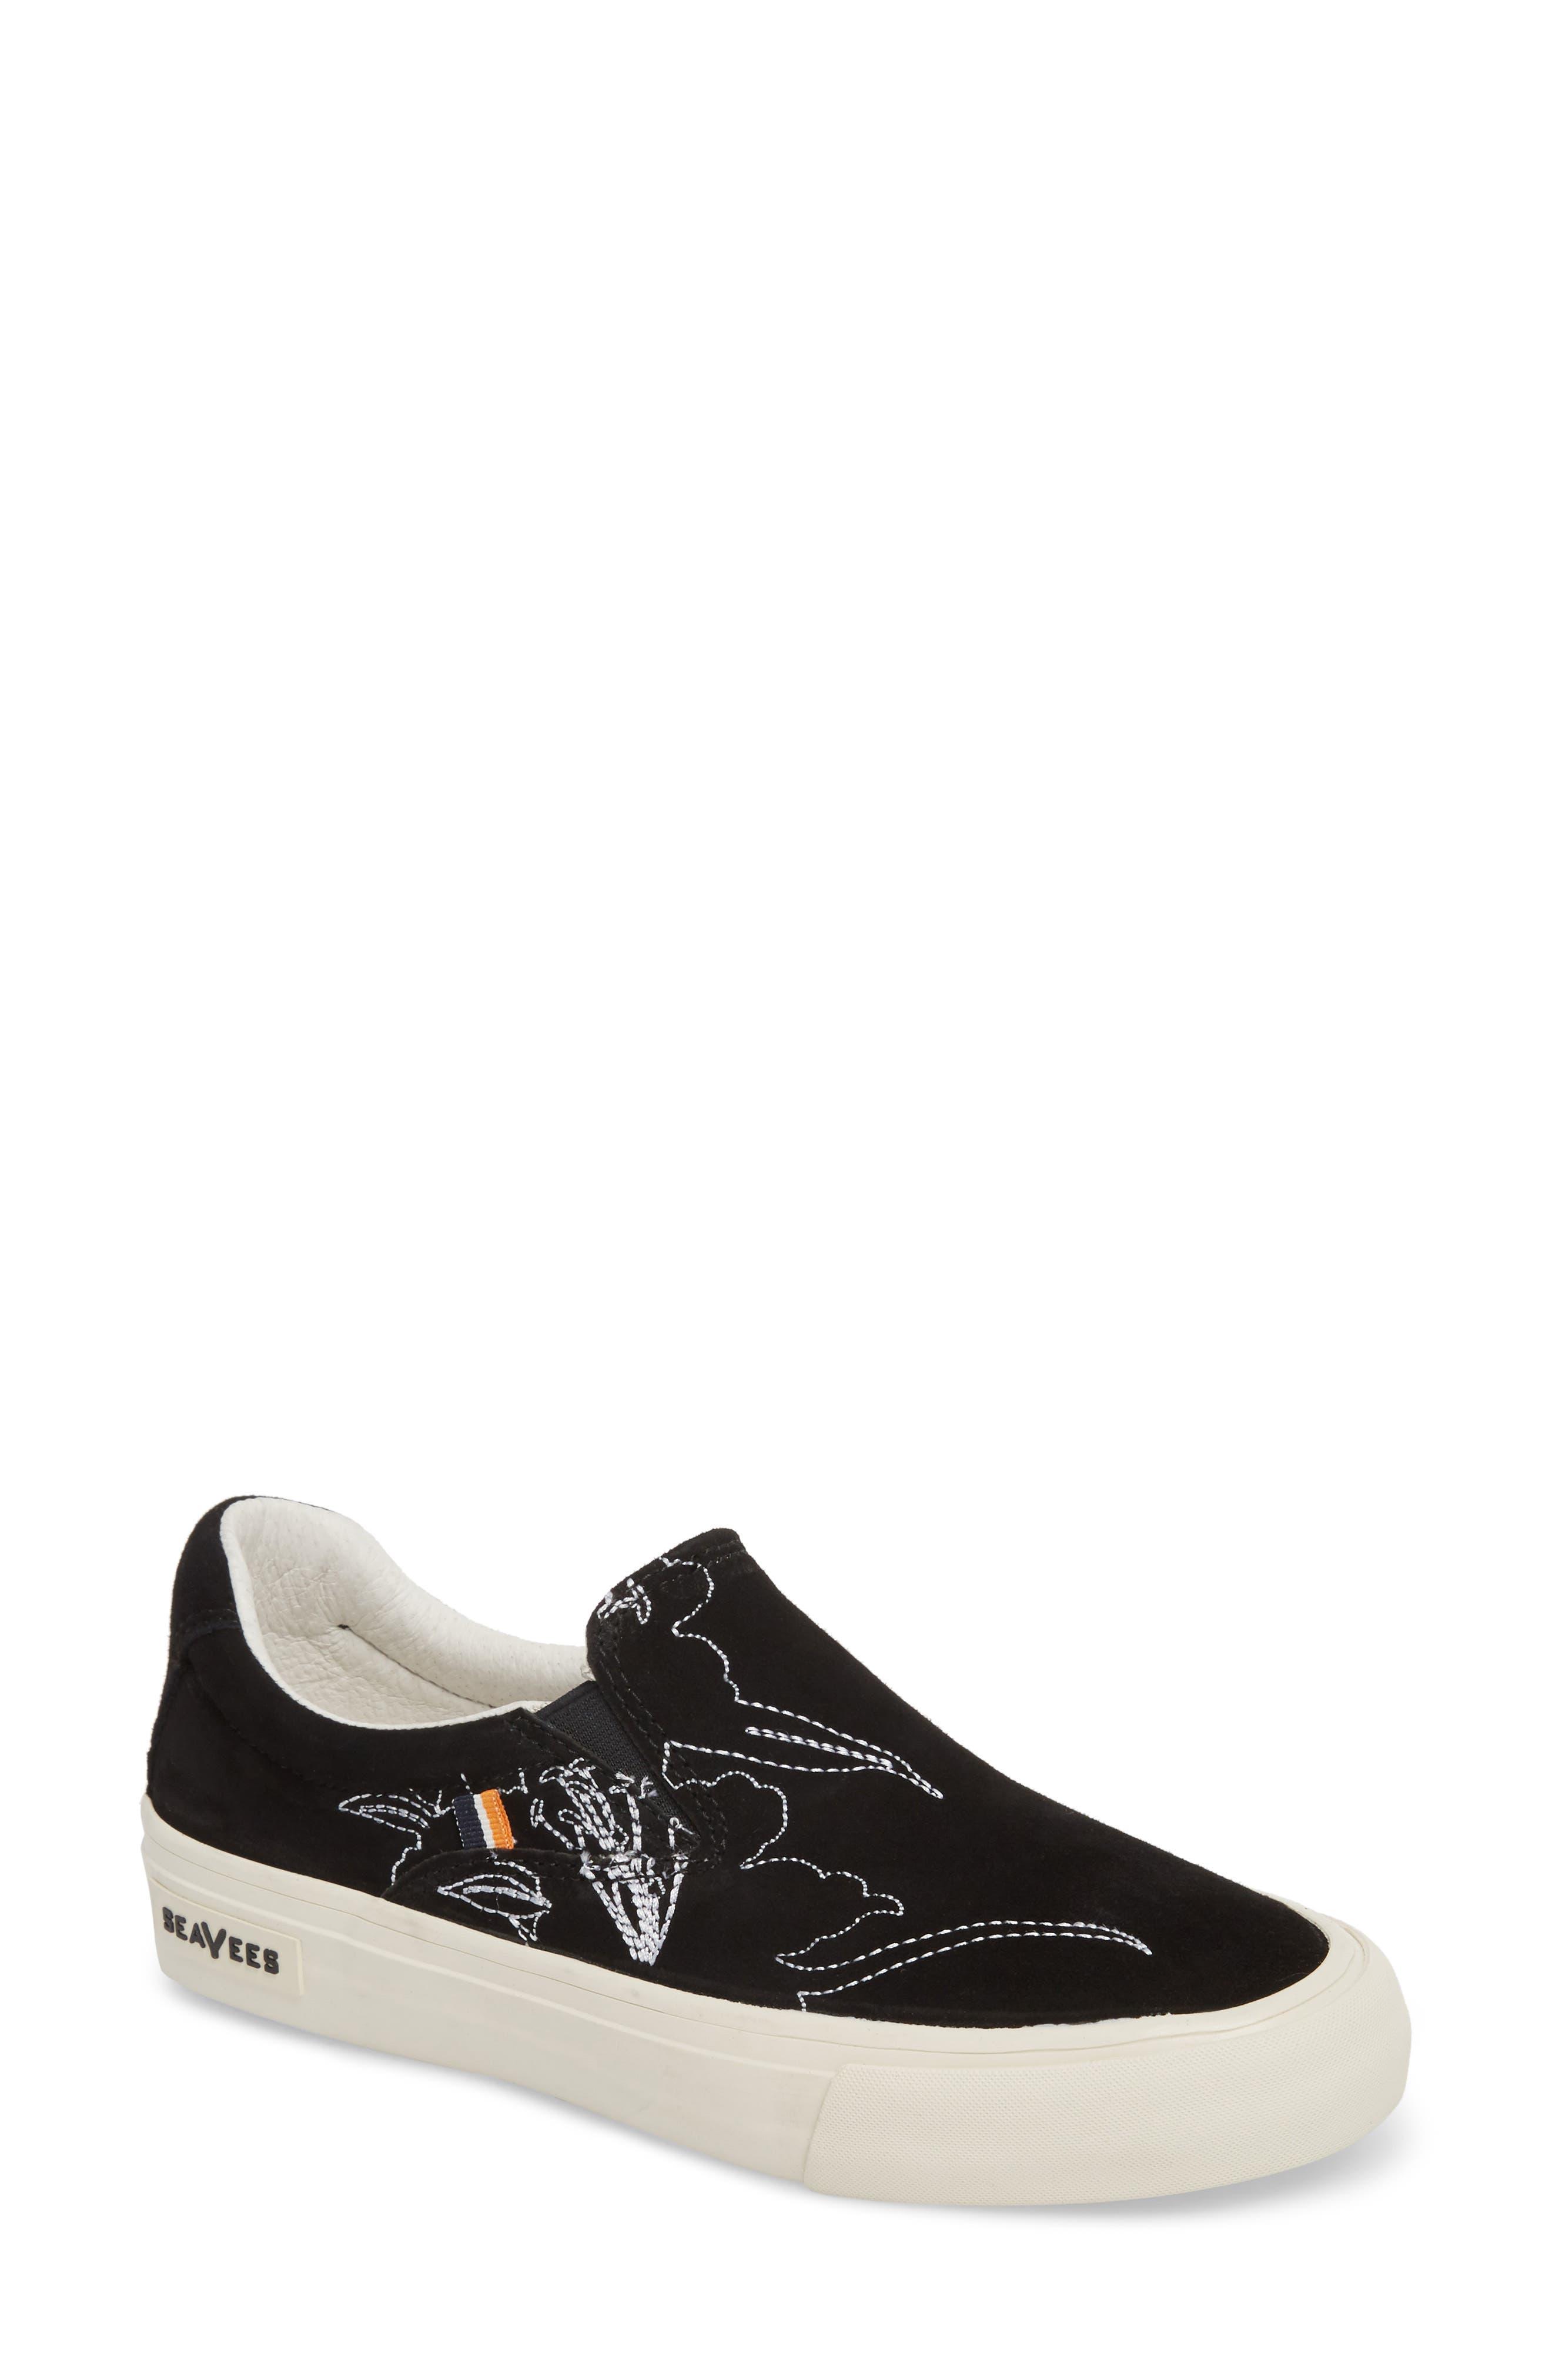 x Derek Lam 10 Crosby Hawthorne Embroidered Slip-On,                         Main,                         color, 001